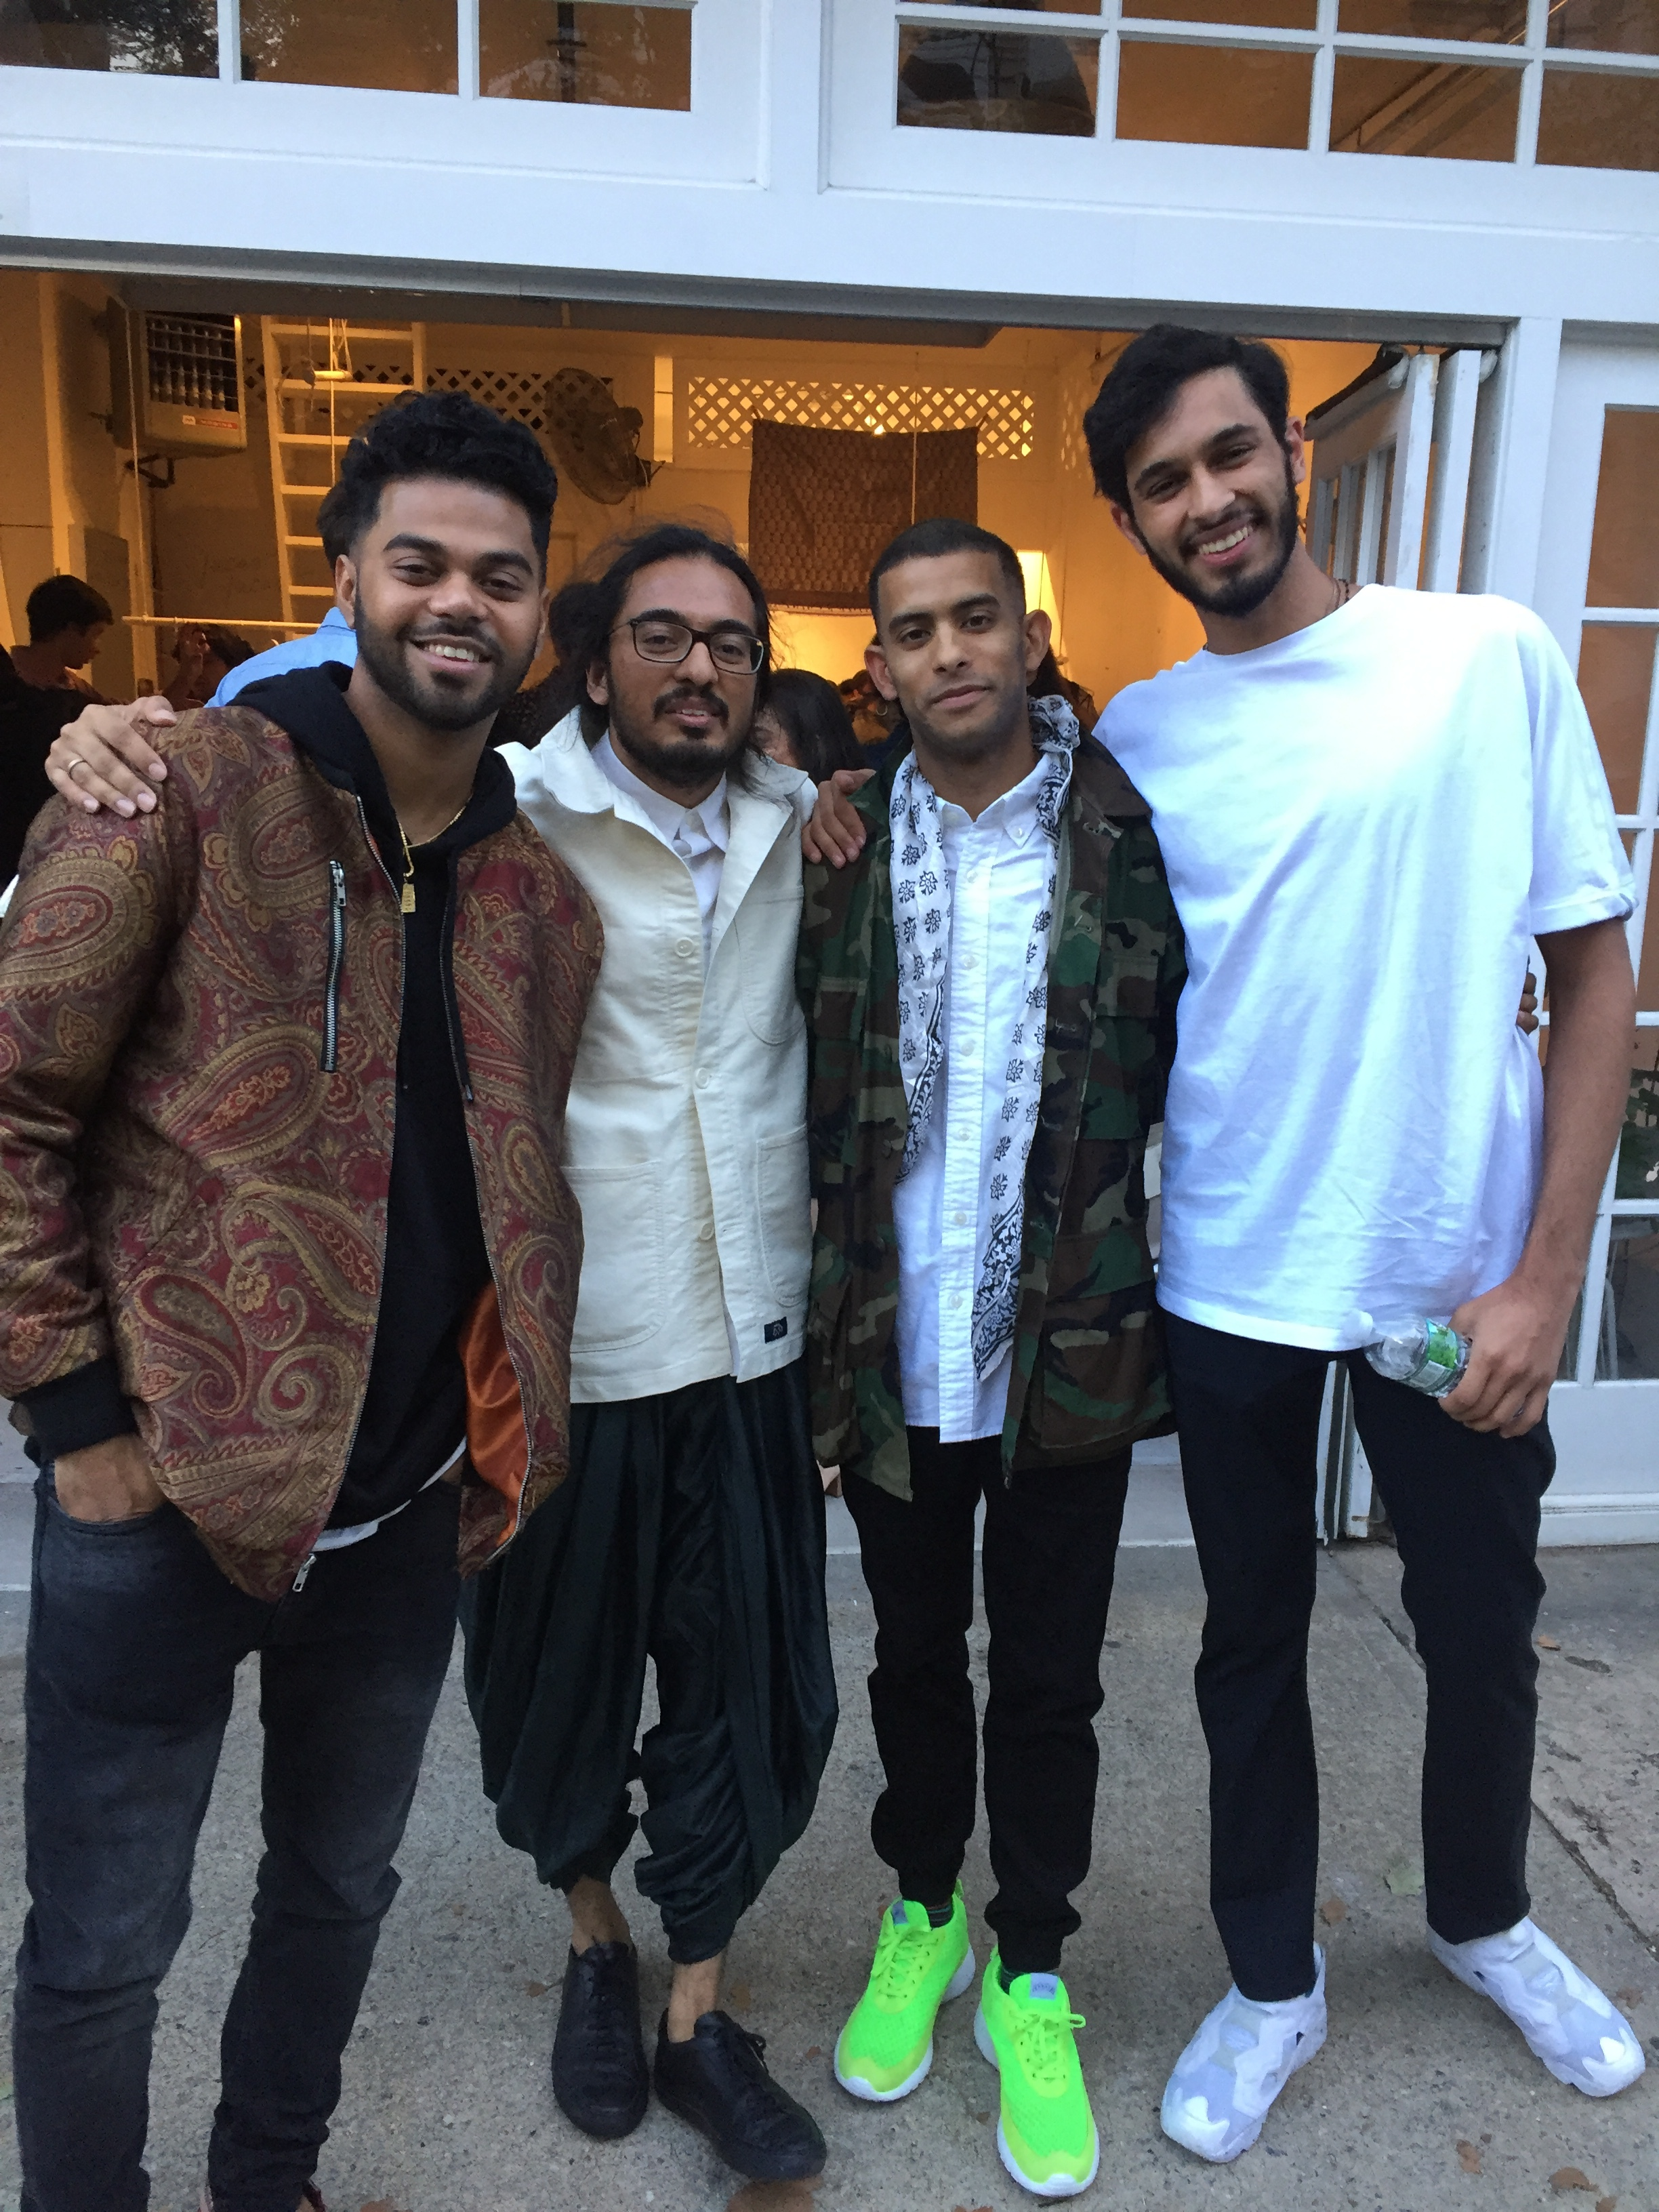 New friends & fits. Anik Khan, Surya Giri, Ani Sanyal, Archit Batlaw